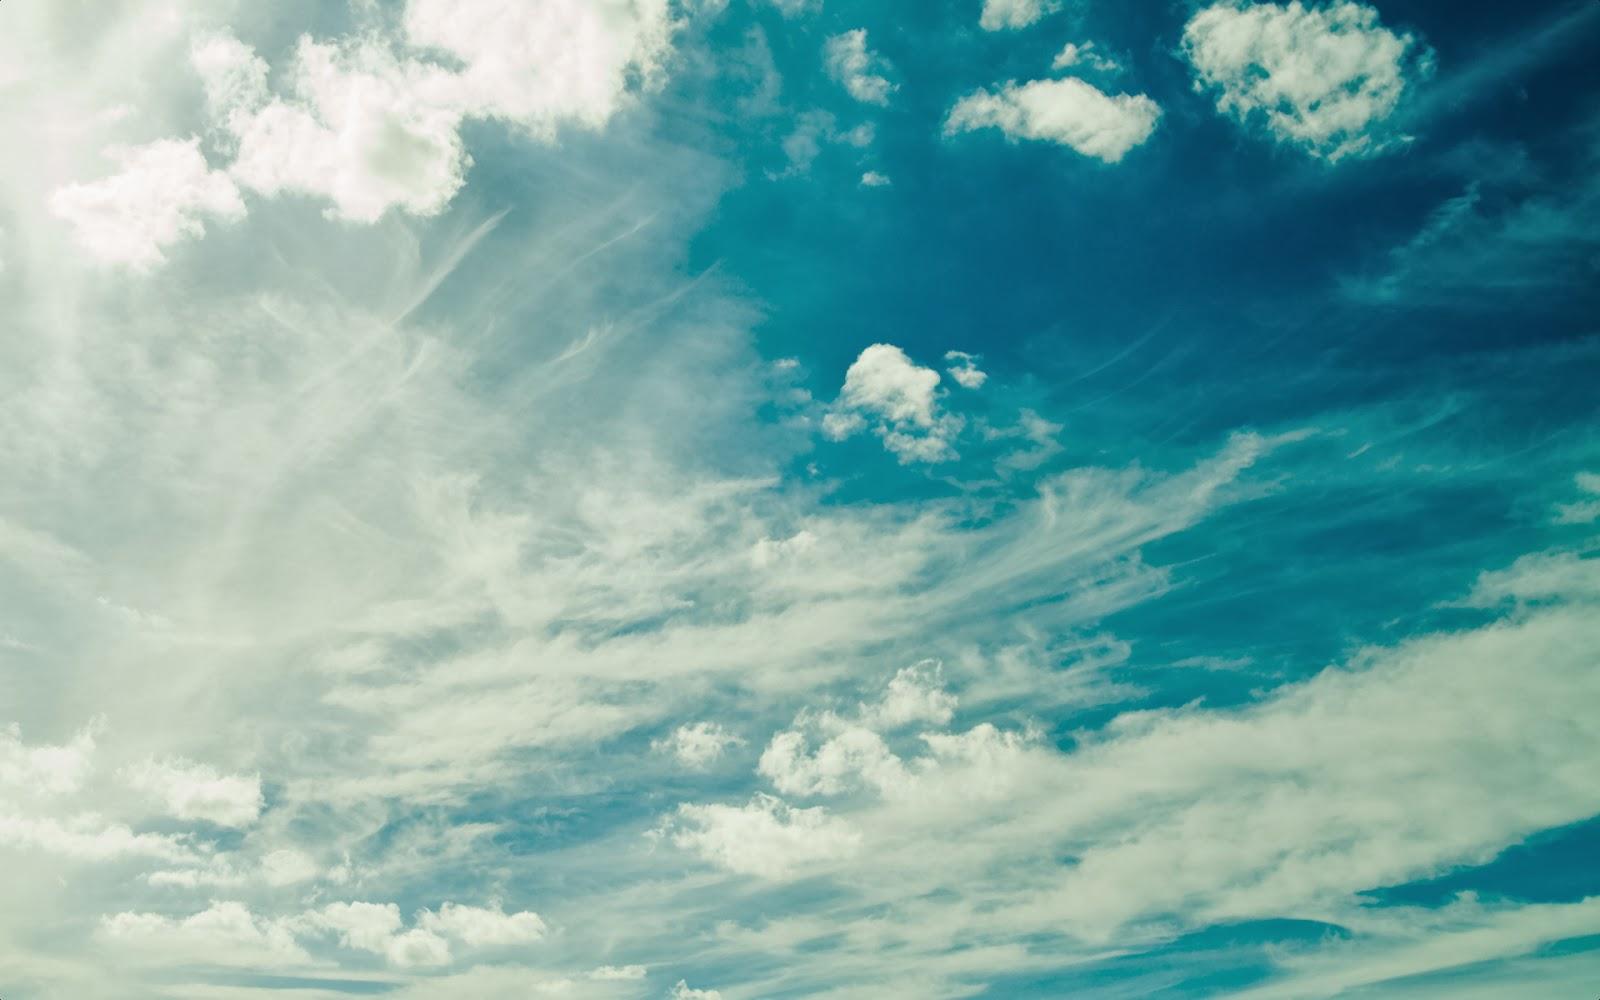 "<img src=""http://1.bp.blogspot.com/-wmBByBfzAyQ/Ut_qRL2AhOI/AAAAAAAAJuI/8ZxA4X81Cg4/s1600/clean-sky.jpg"" alt=""clean sky"" />"